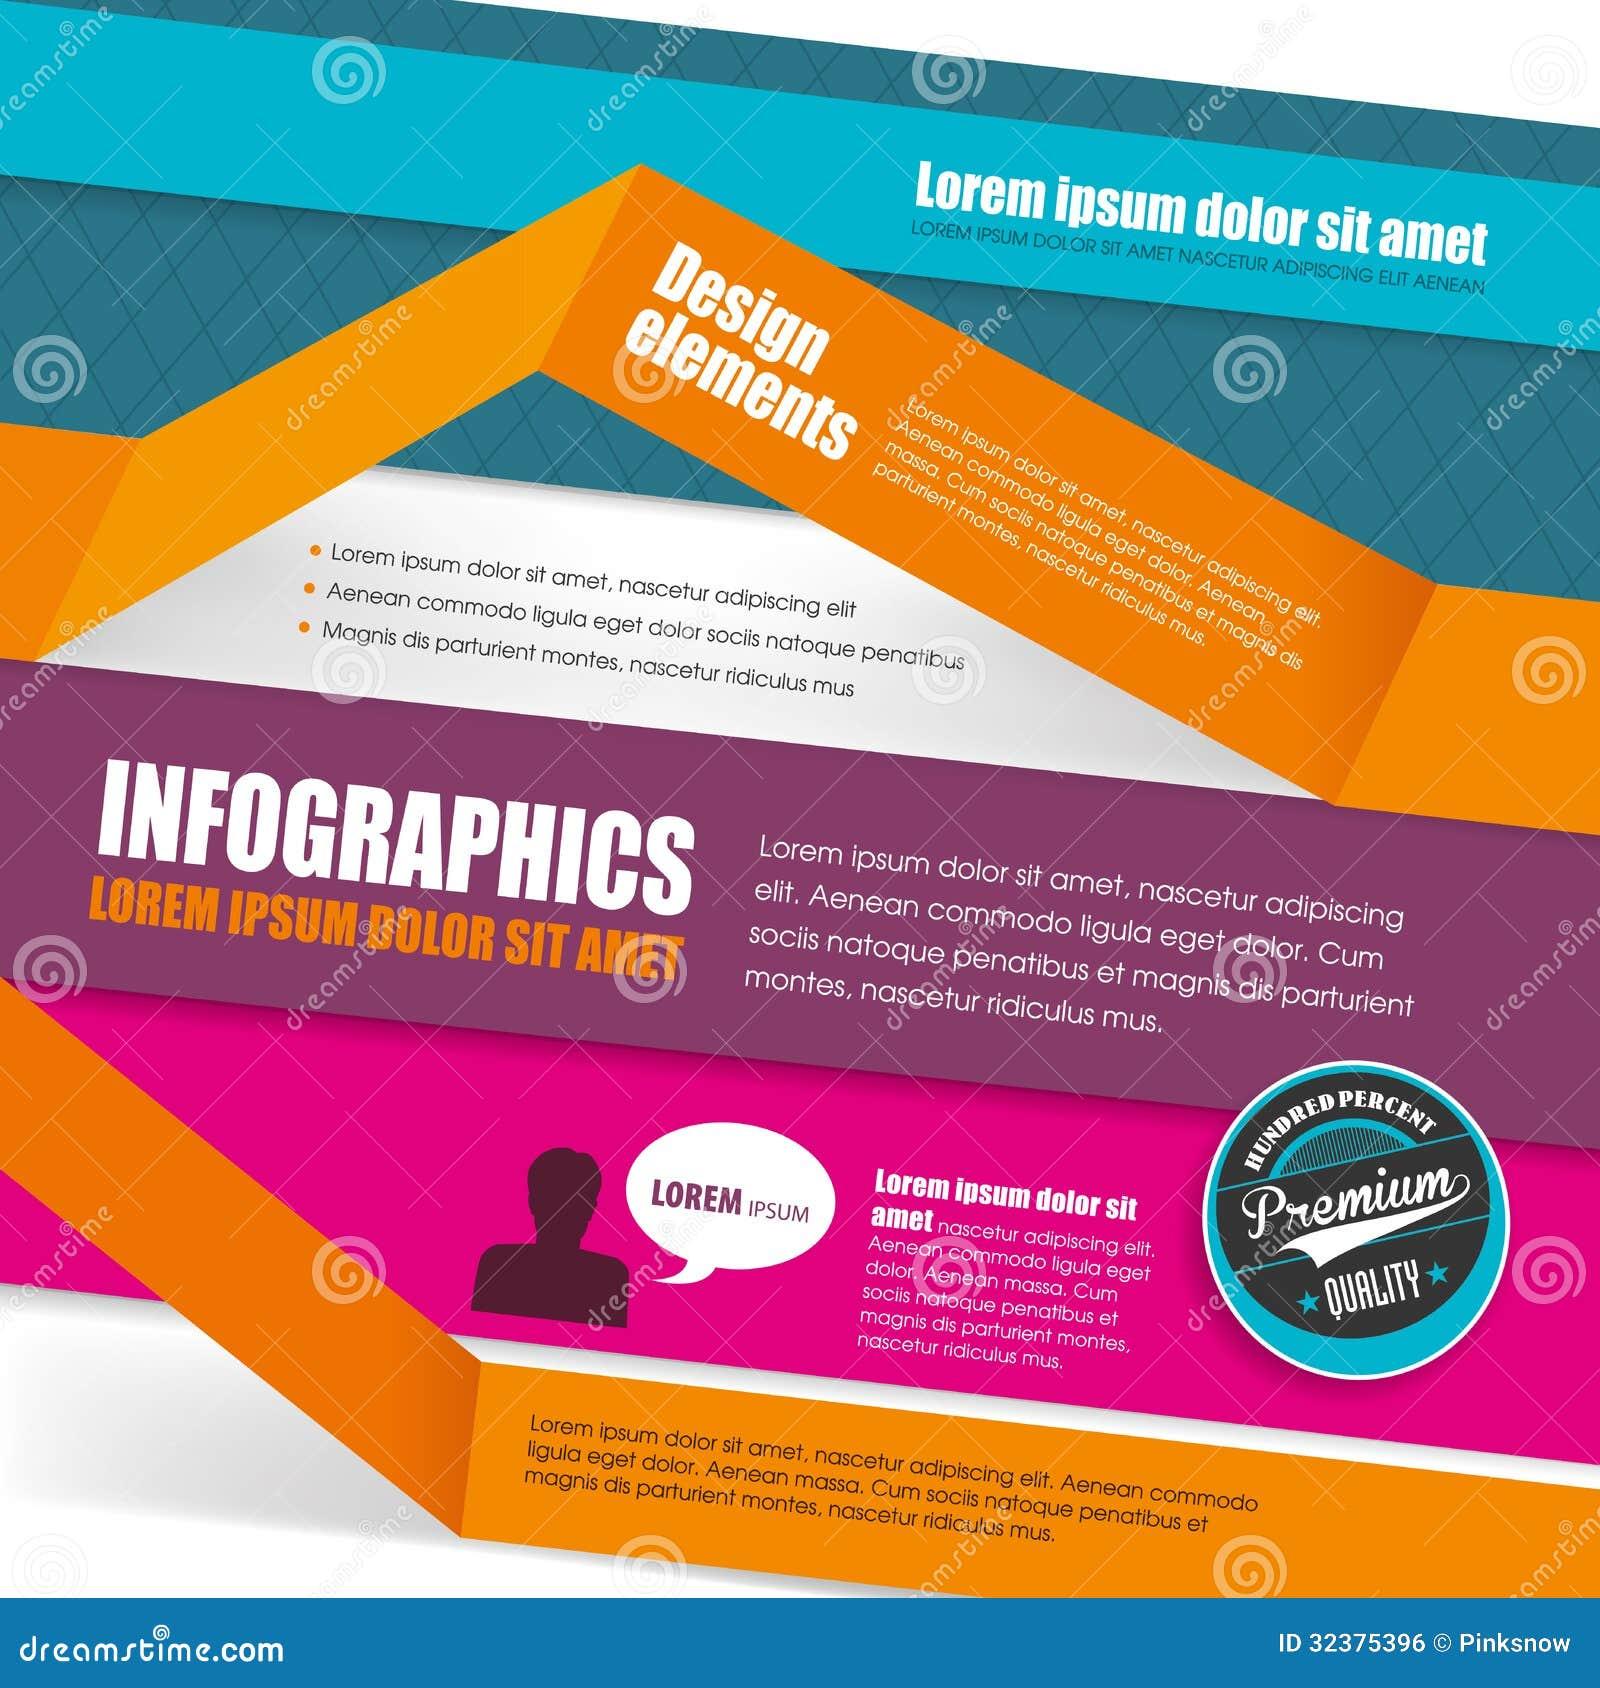 Infographic malldesign